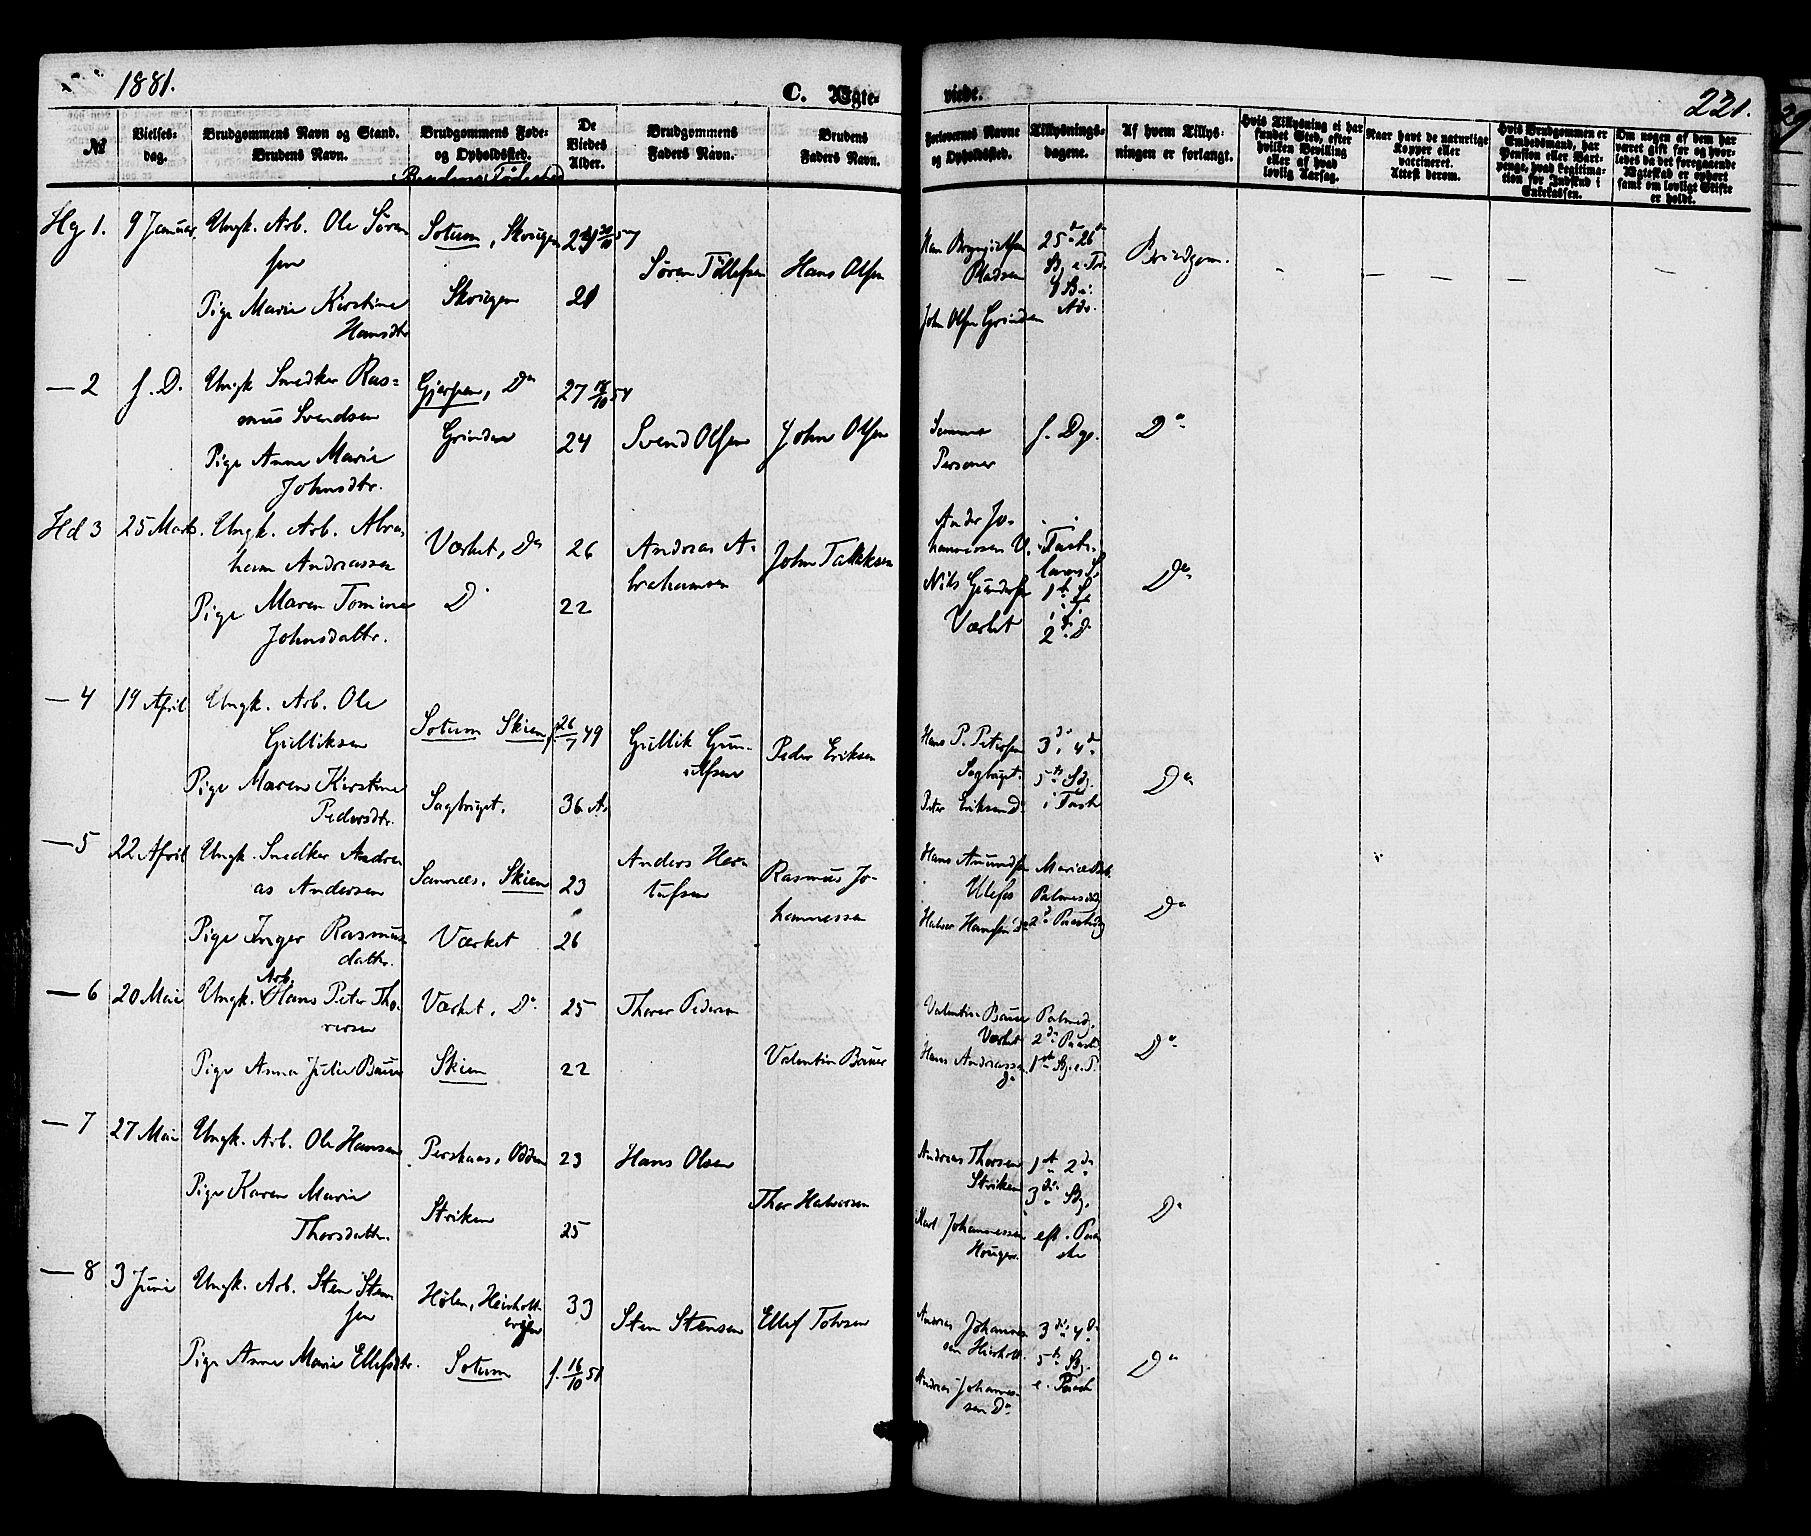 SAKO, Holla kirkebøker, F/Fa/L0007: Ministerialbok nr. 7, 1869-1881, s. 221